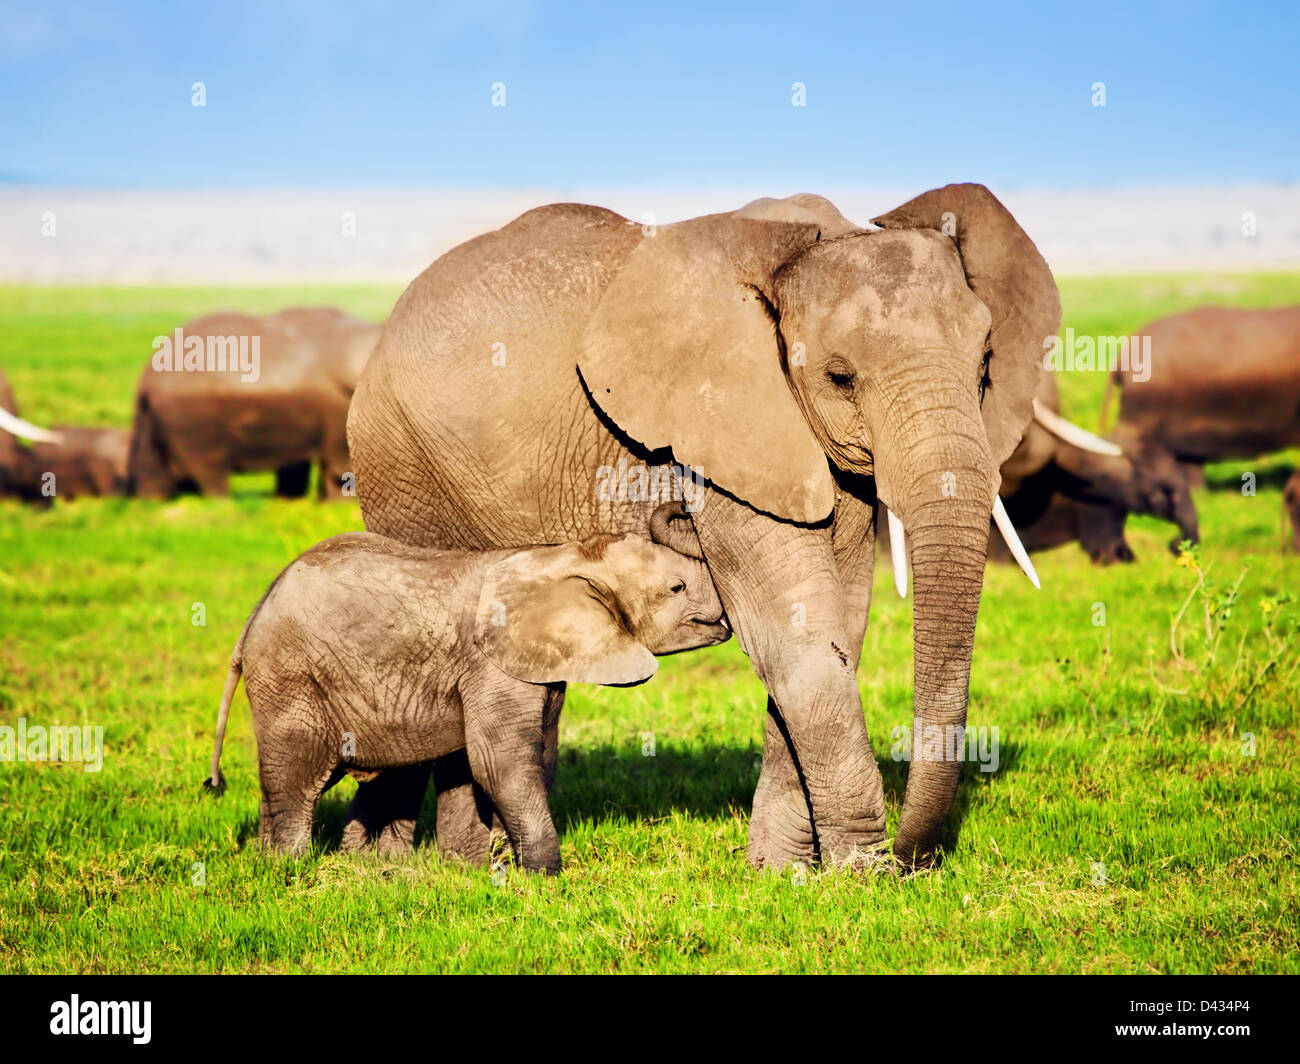 Mother African elephant and baby elephant in Amboseli National Park, Kenya, Africa (Loxodonta africana) - Stock Image